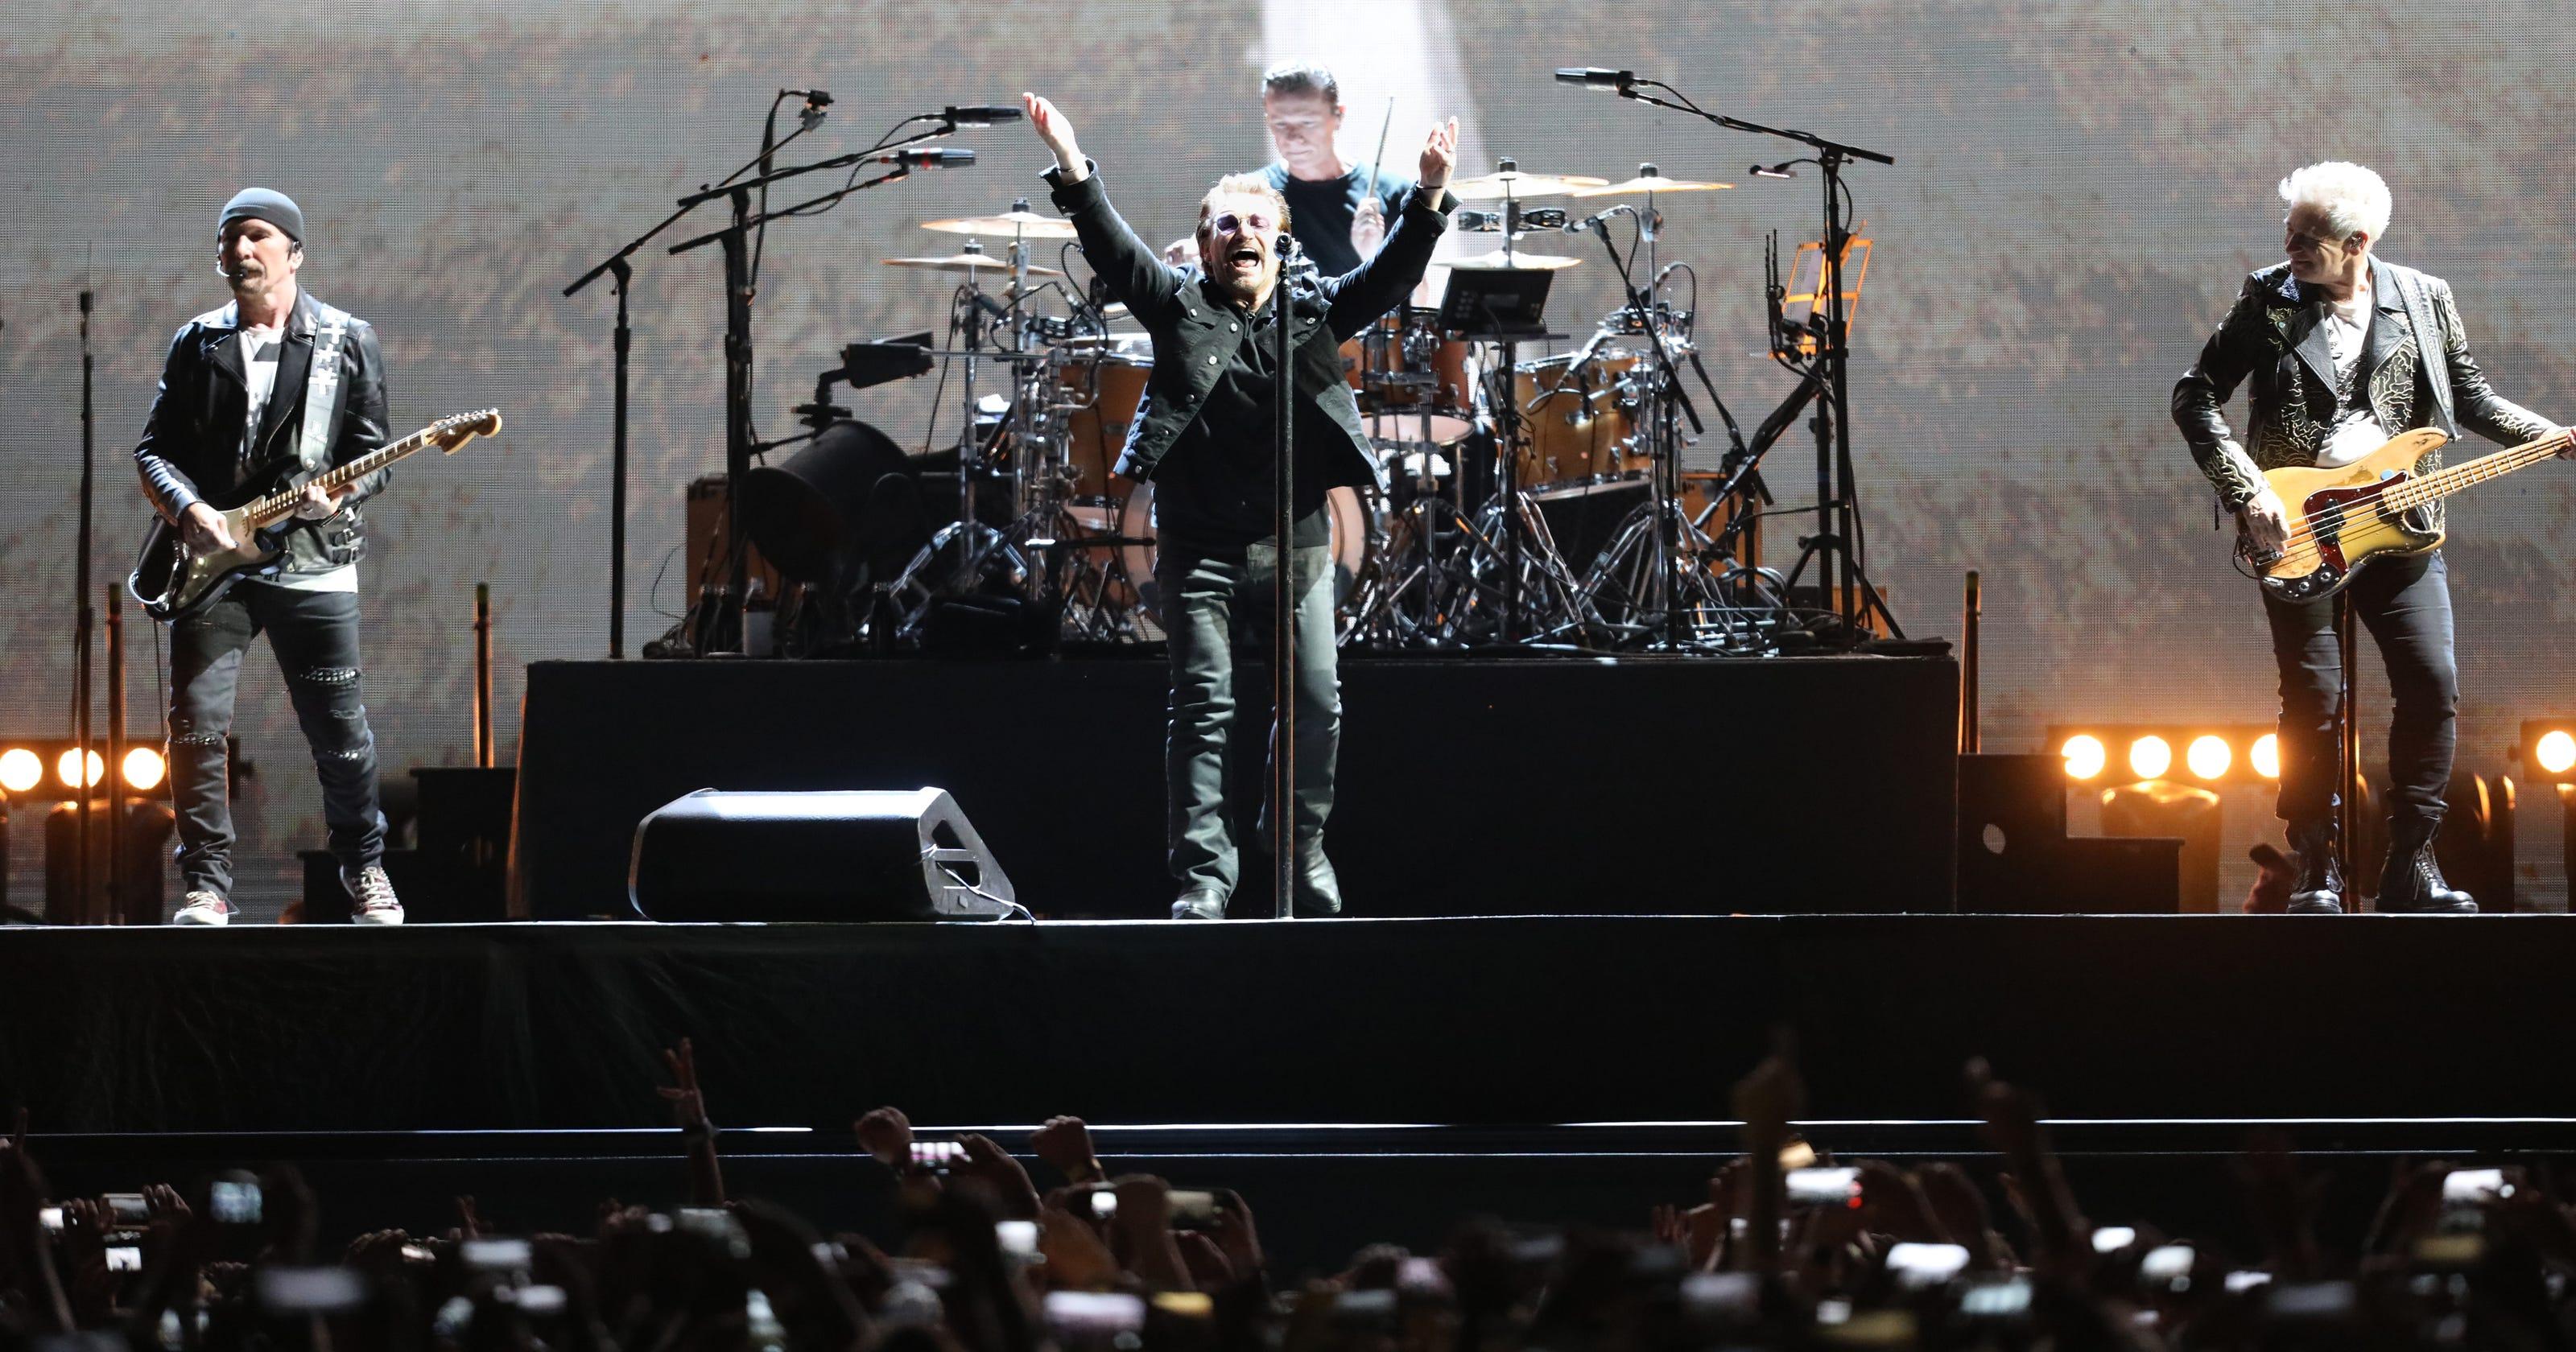 Review: U2 The Joshua Tree Tour 2017 at MetLife Stadium